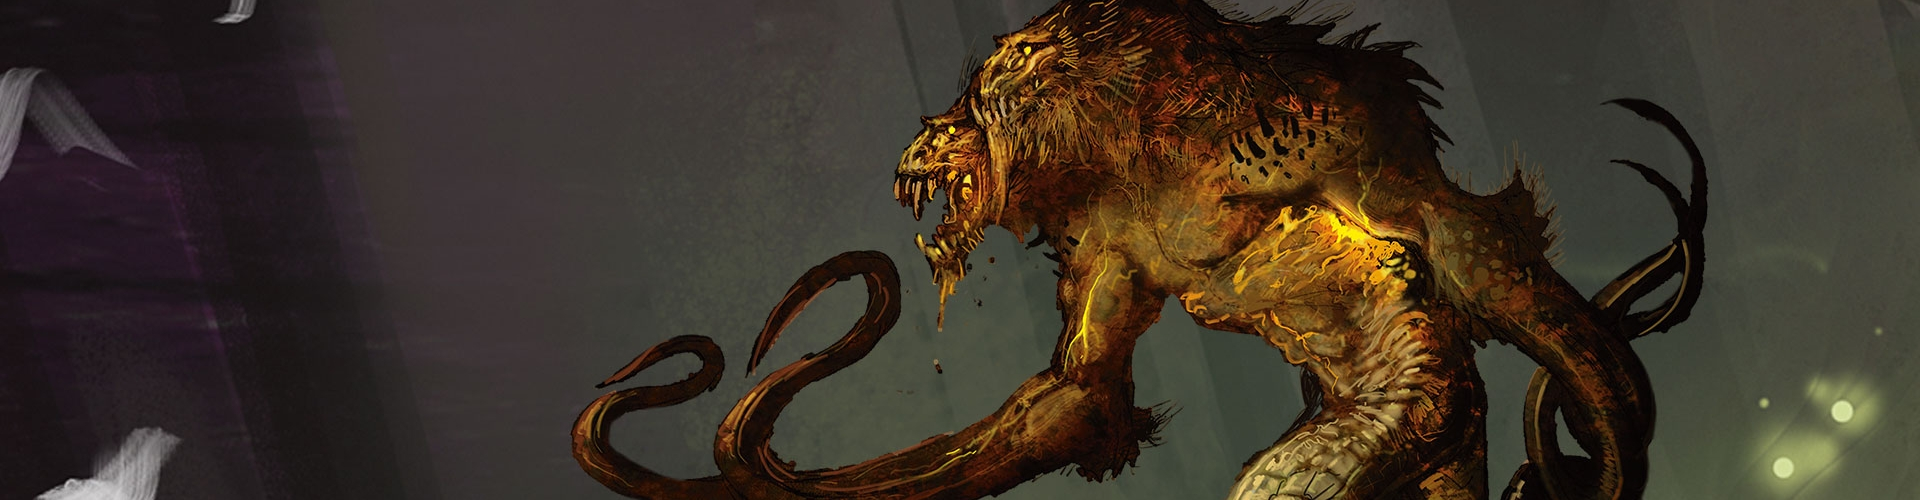 Demogorgon: Prince of Demons